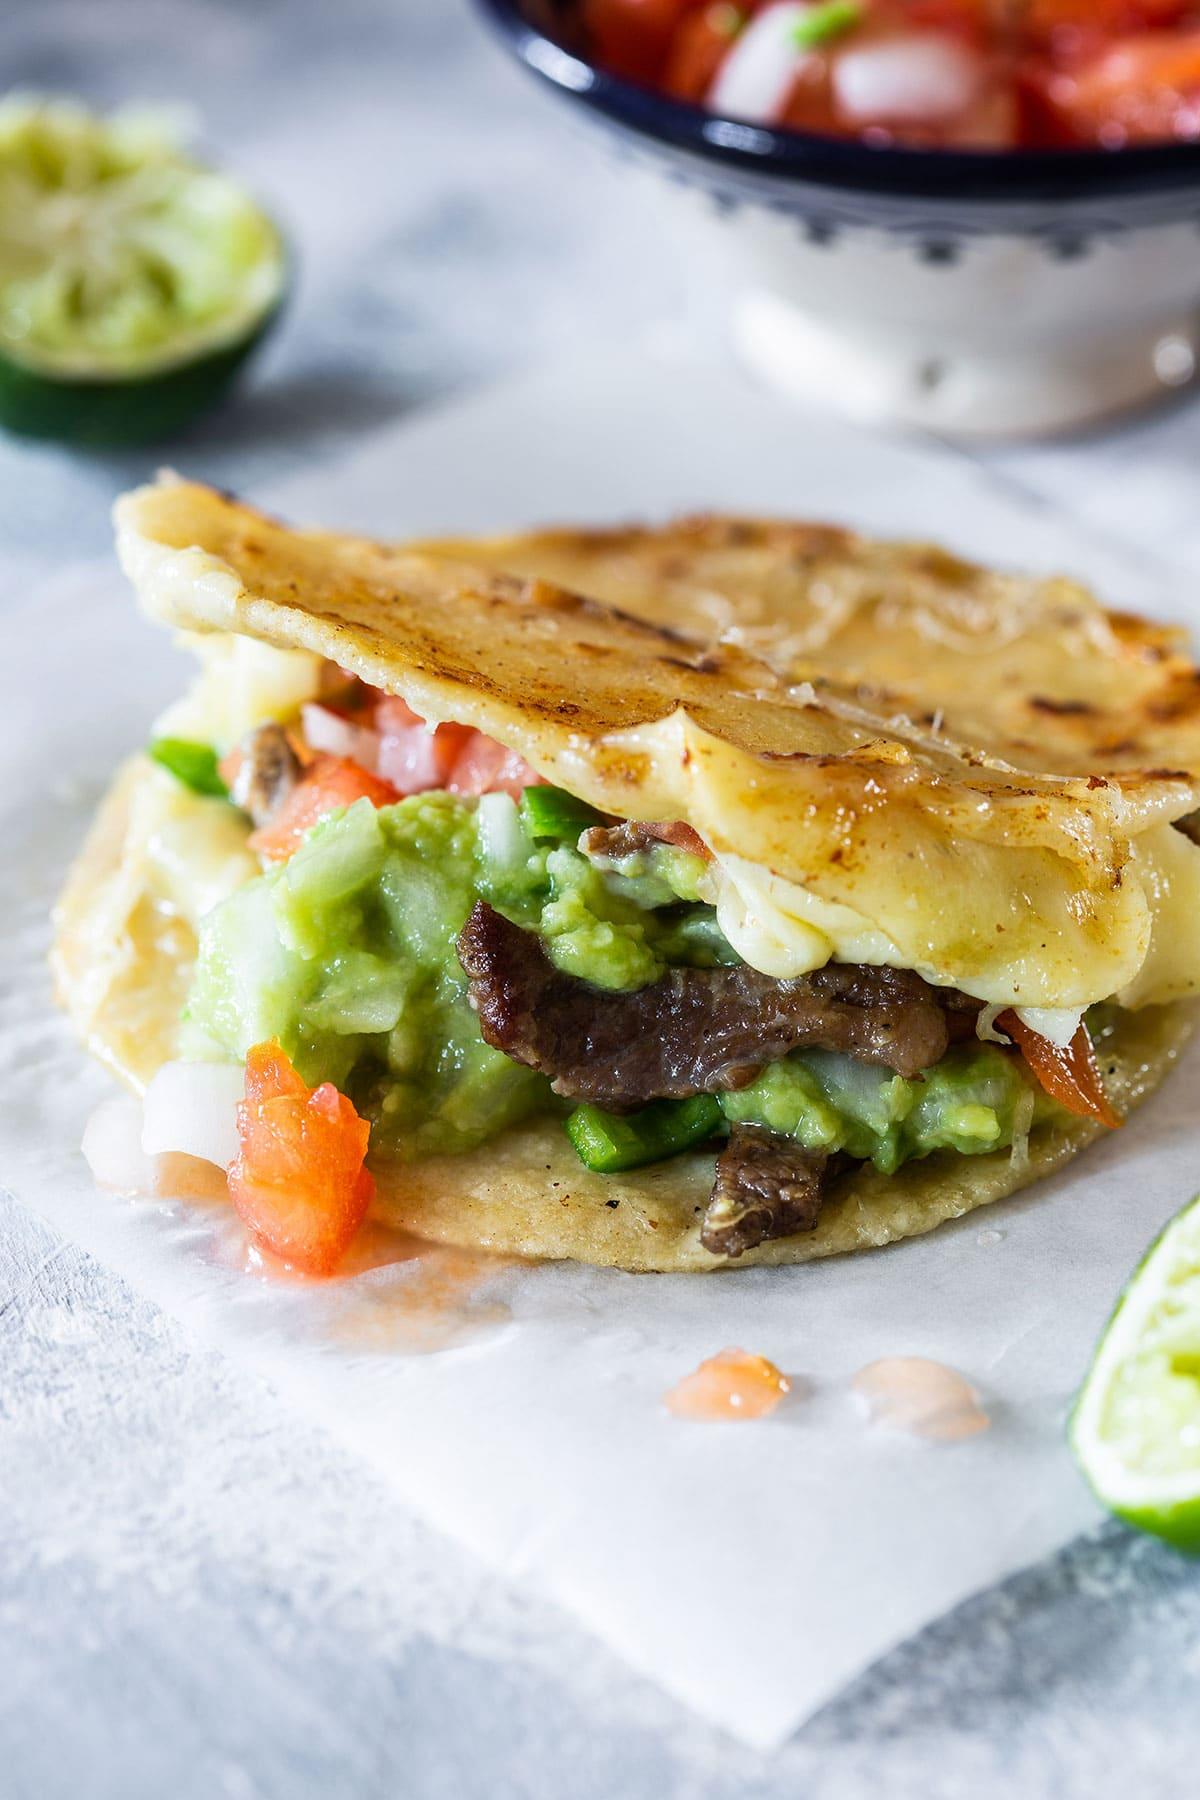 A mulita stuffed with carne asada, cheese, guacamole and pico de gallo salsa.